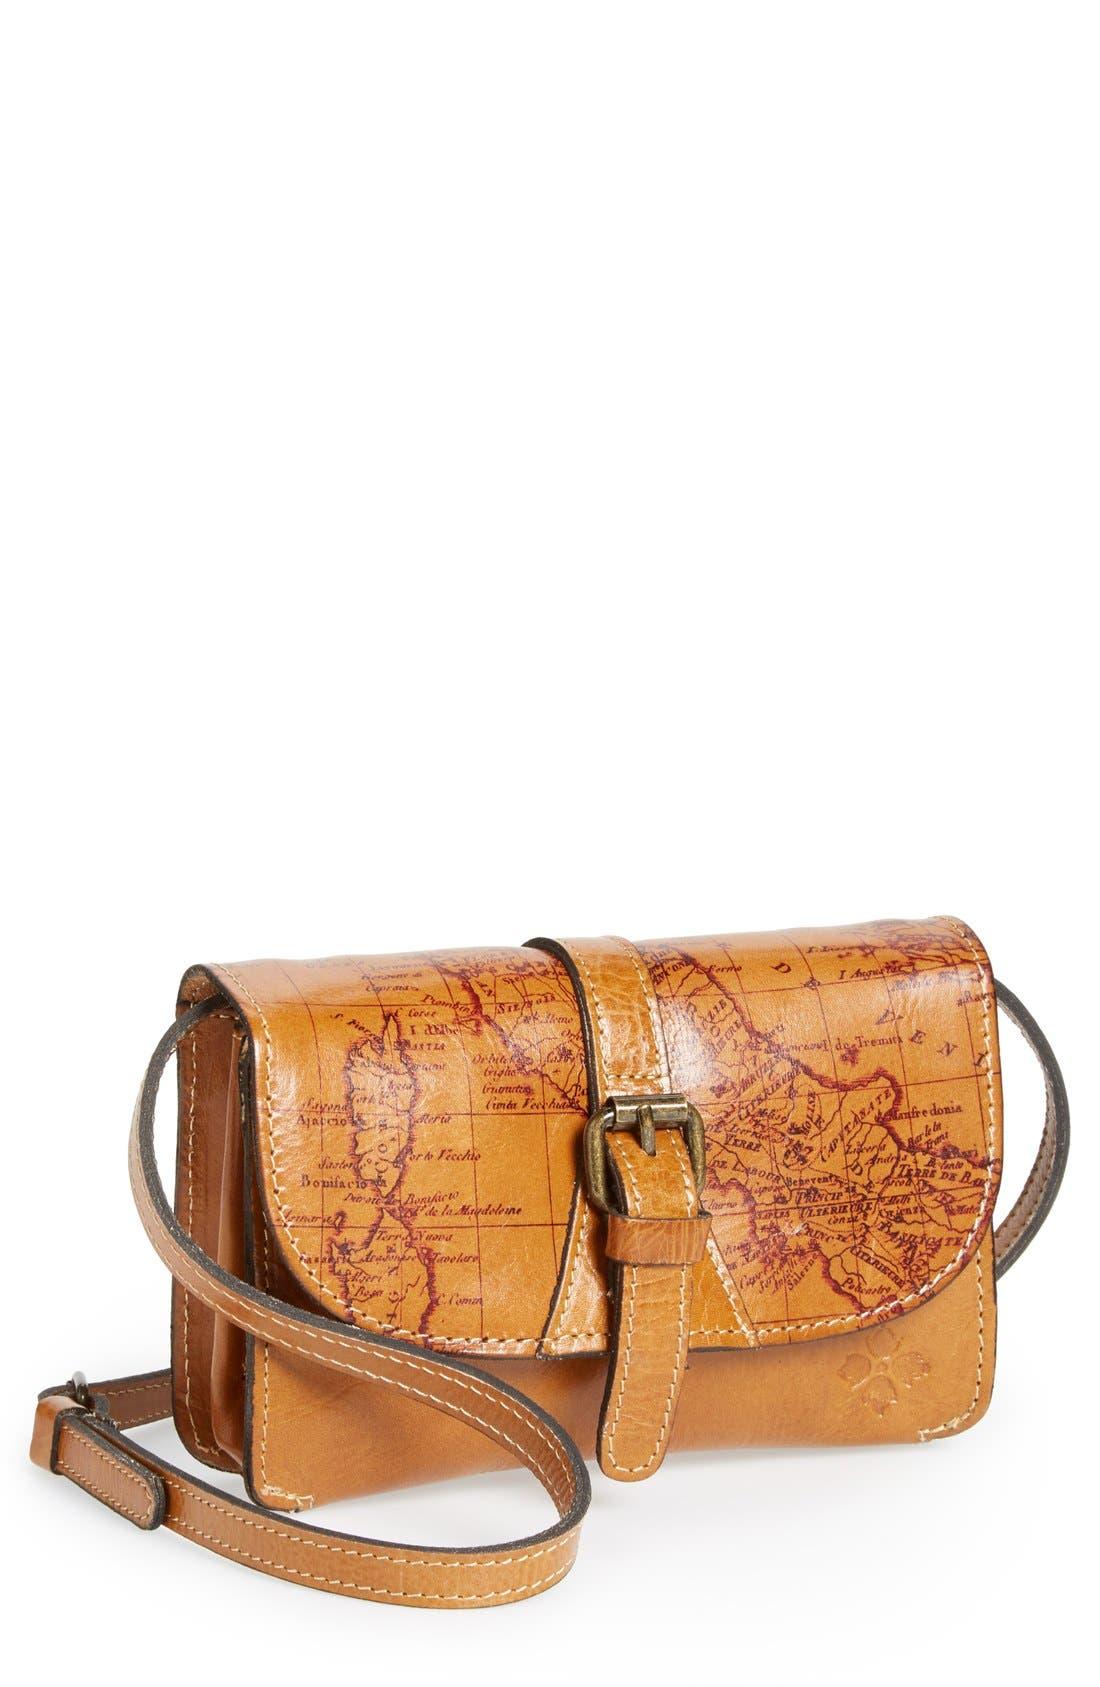 Alternate Image 1 Selected - Patricia Nash 'Torri' Leather Crossbody Bag